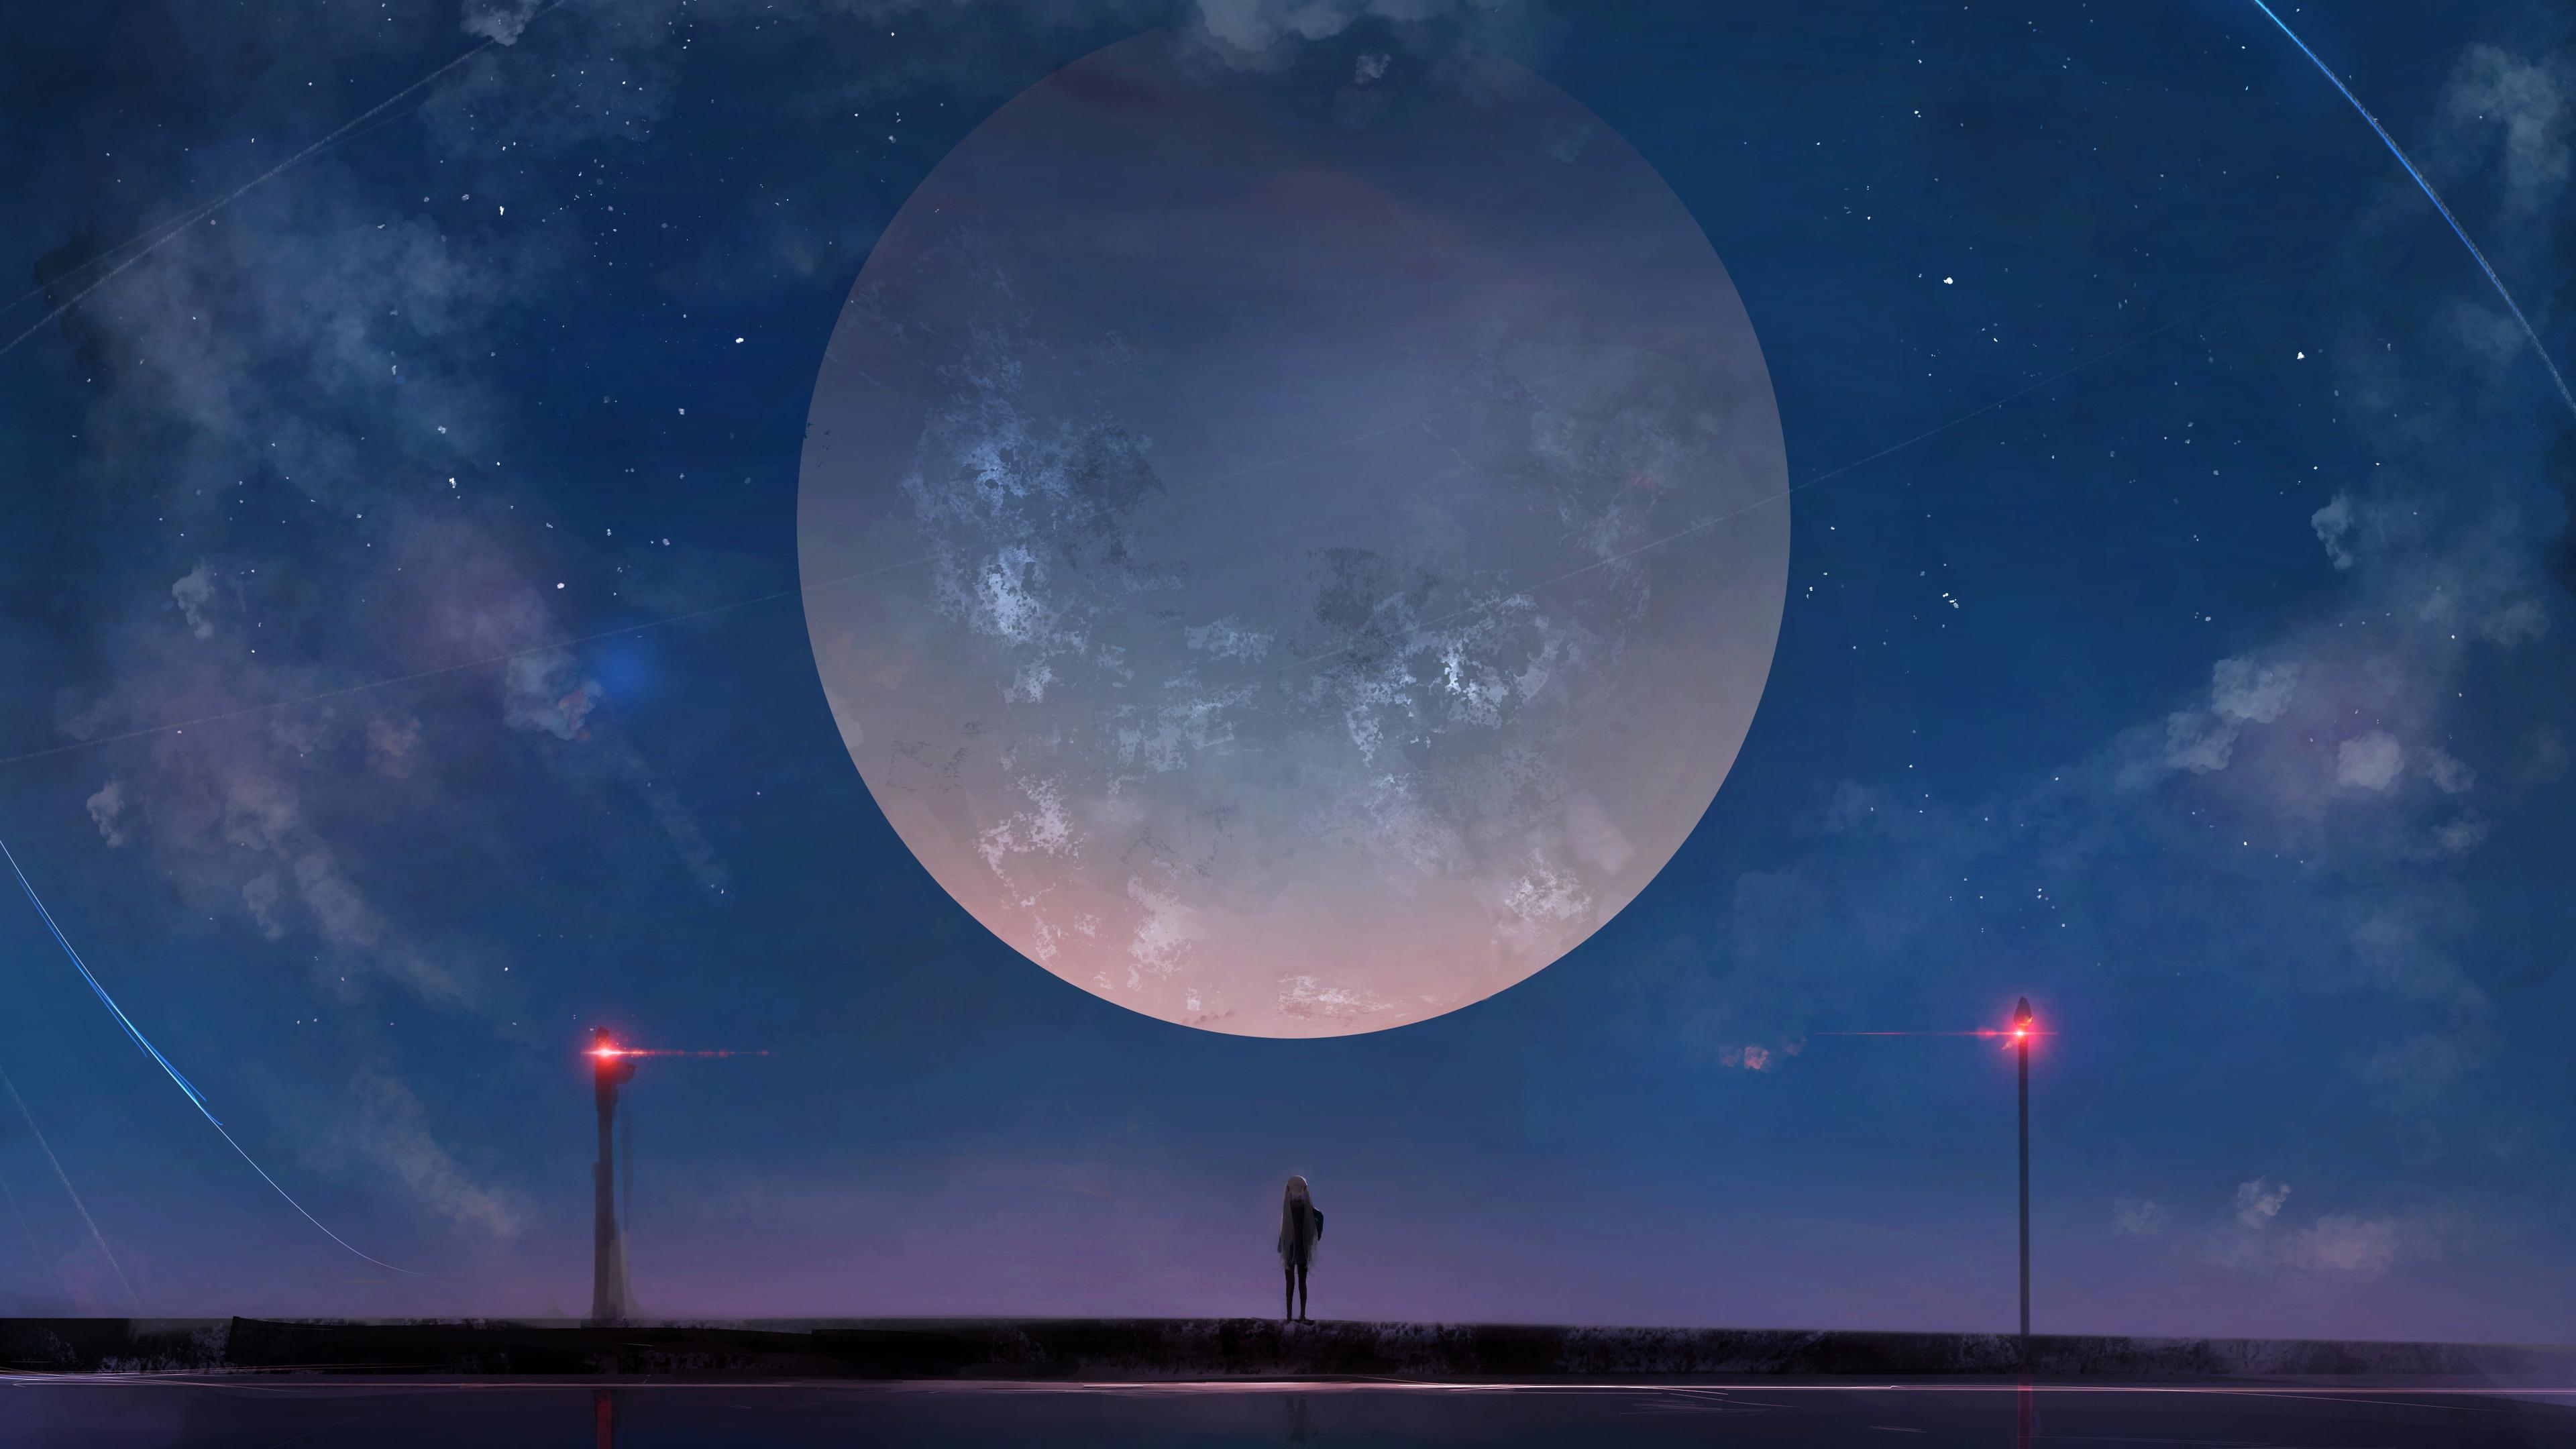 huge moon anime girl night sky stars 1541974174 - Huge Moon Anime Girl Night Sky Stars - stars wallpapers, sky wallpapers, night wallpapers, moon wallpapers, hd-wallpapers, deviantart wallpapers, anime wallpapers, anime girl wallpapers, 4k-wallpapers